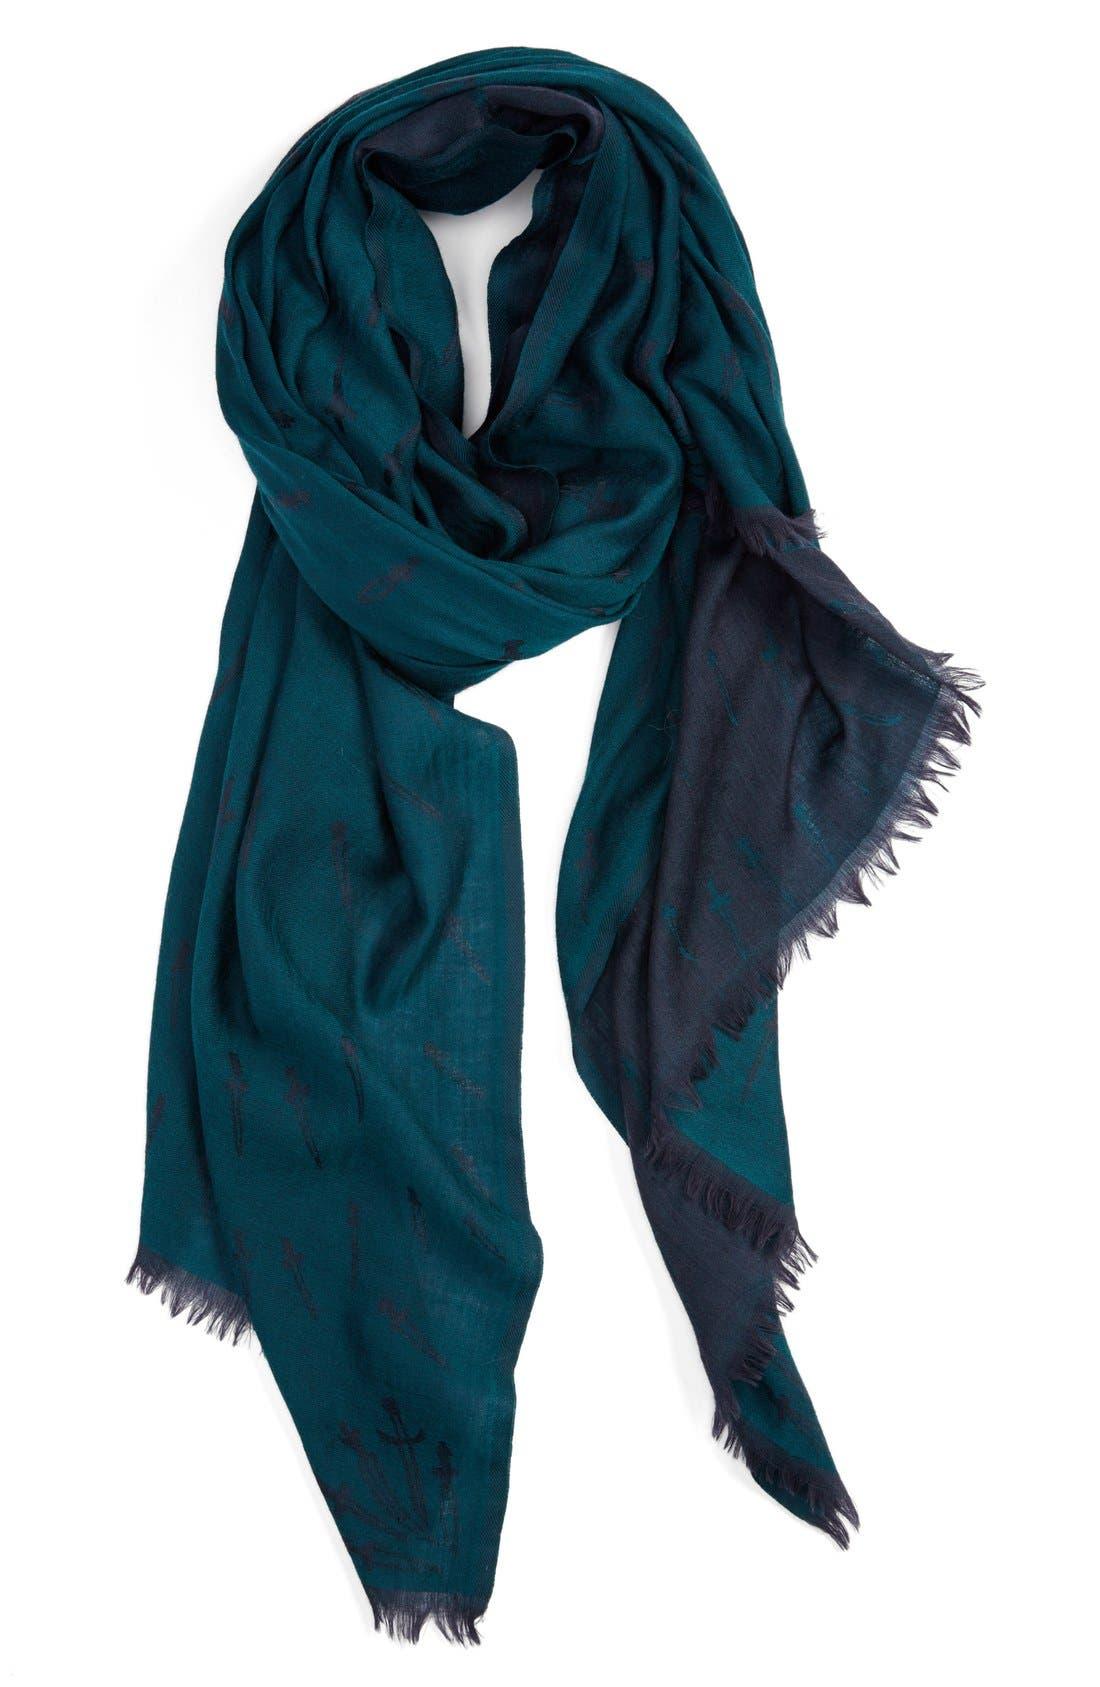 Alternate Image 1 Selected - rag & bone 'Dagger' Wool Jacquard Scarf